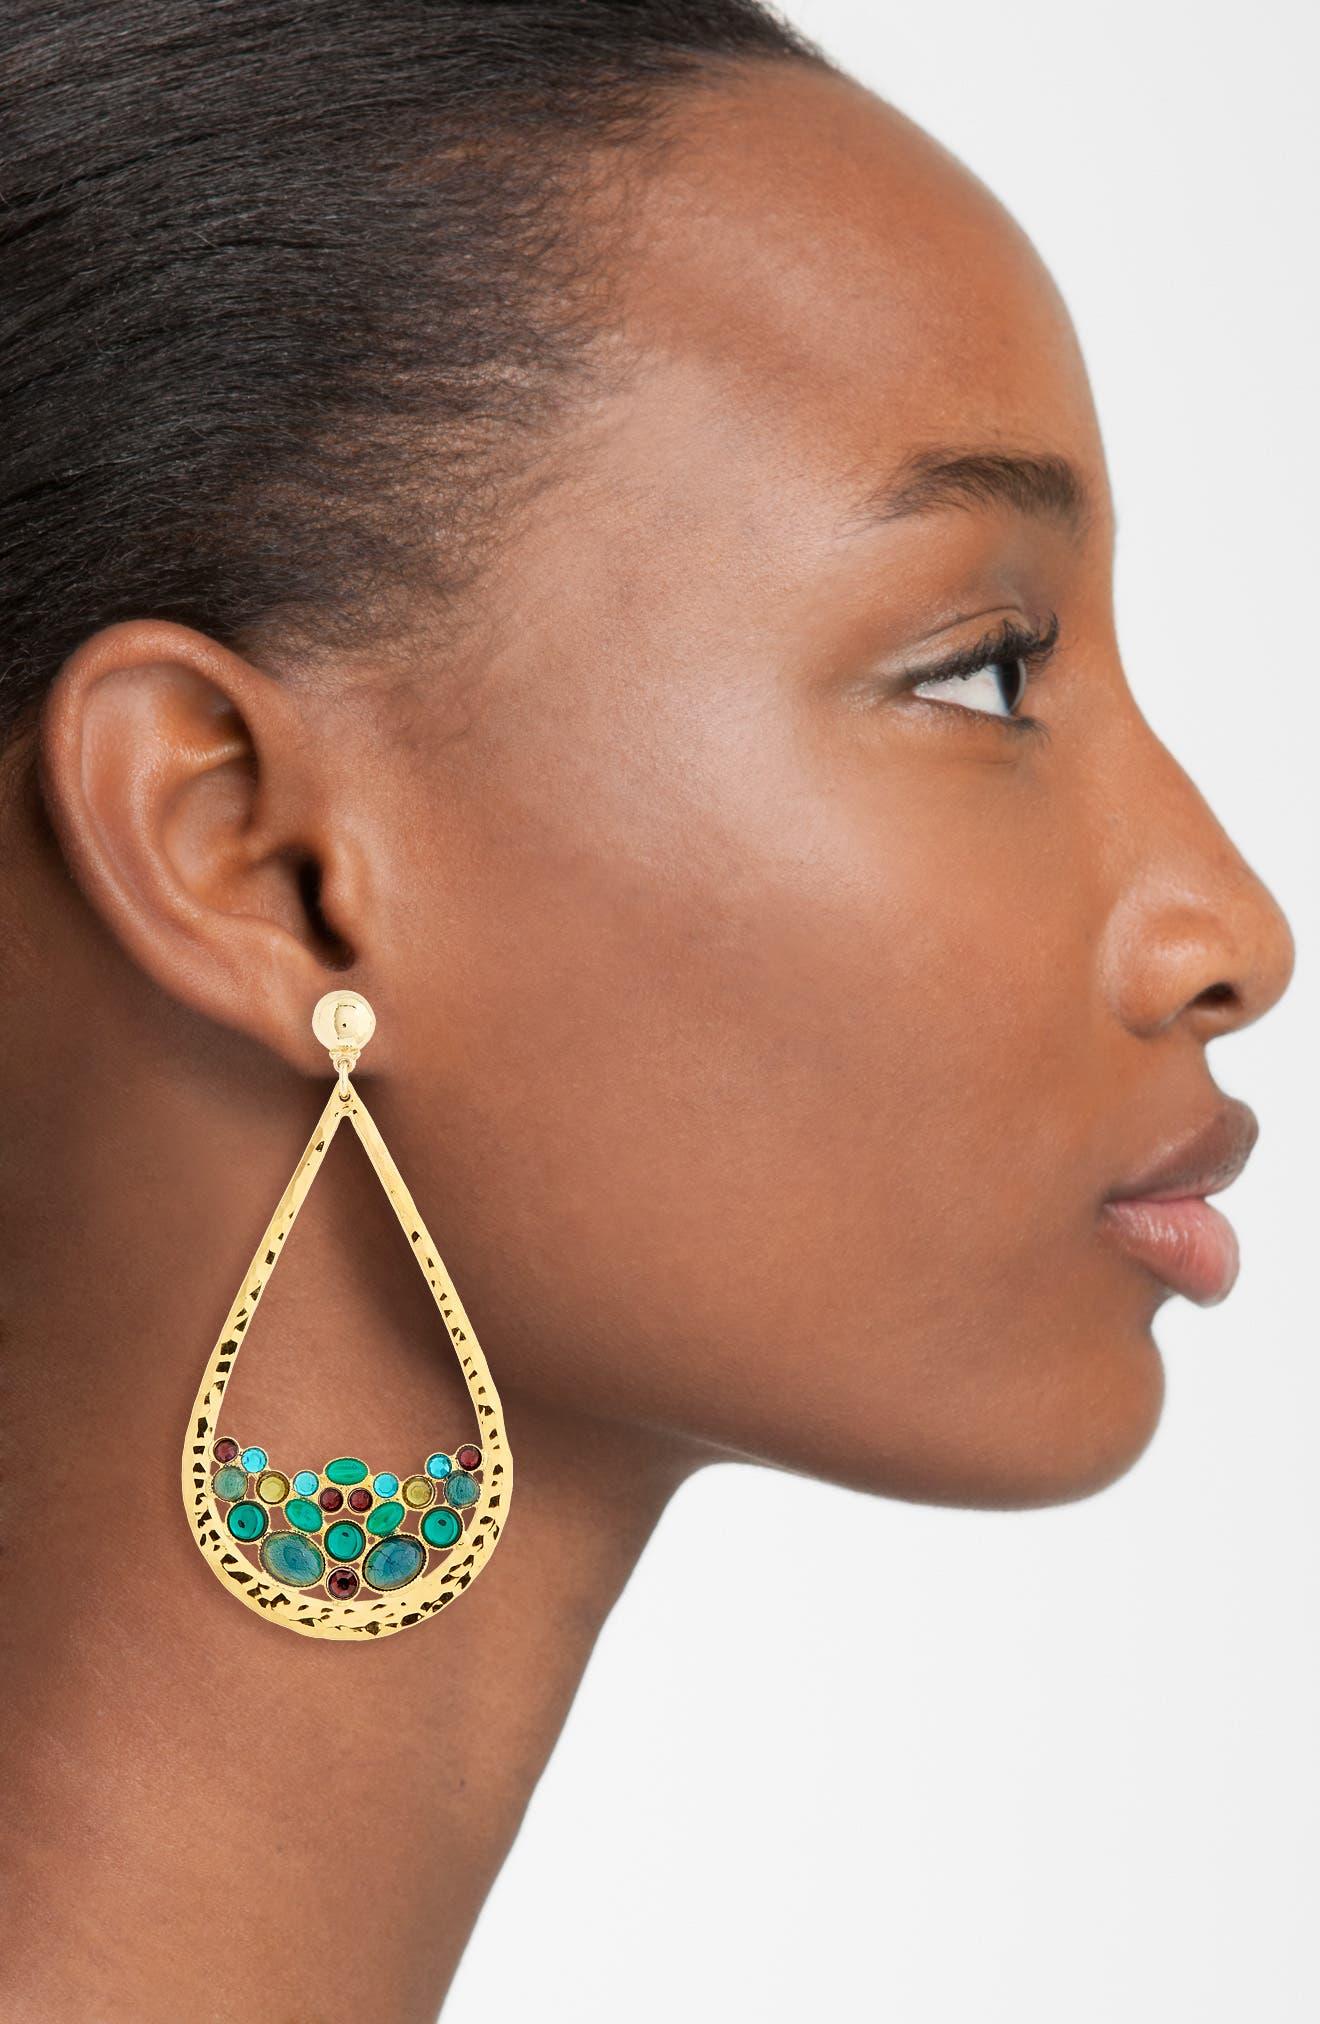 Byzance Crystal Drop Earrings,                             Alternate thumbnail 2, color,                             400